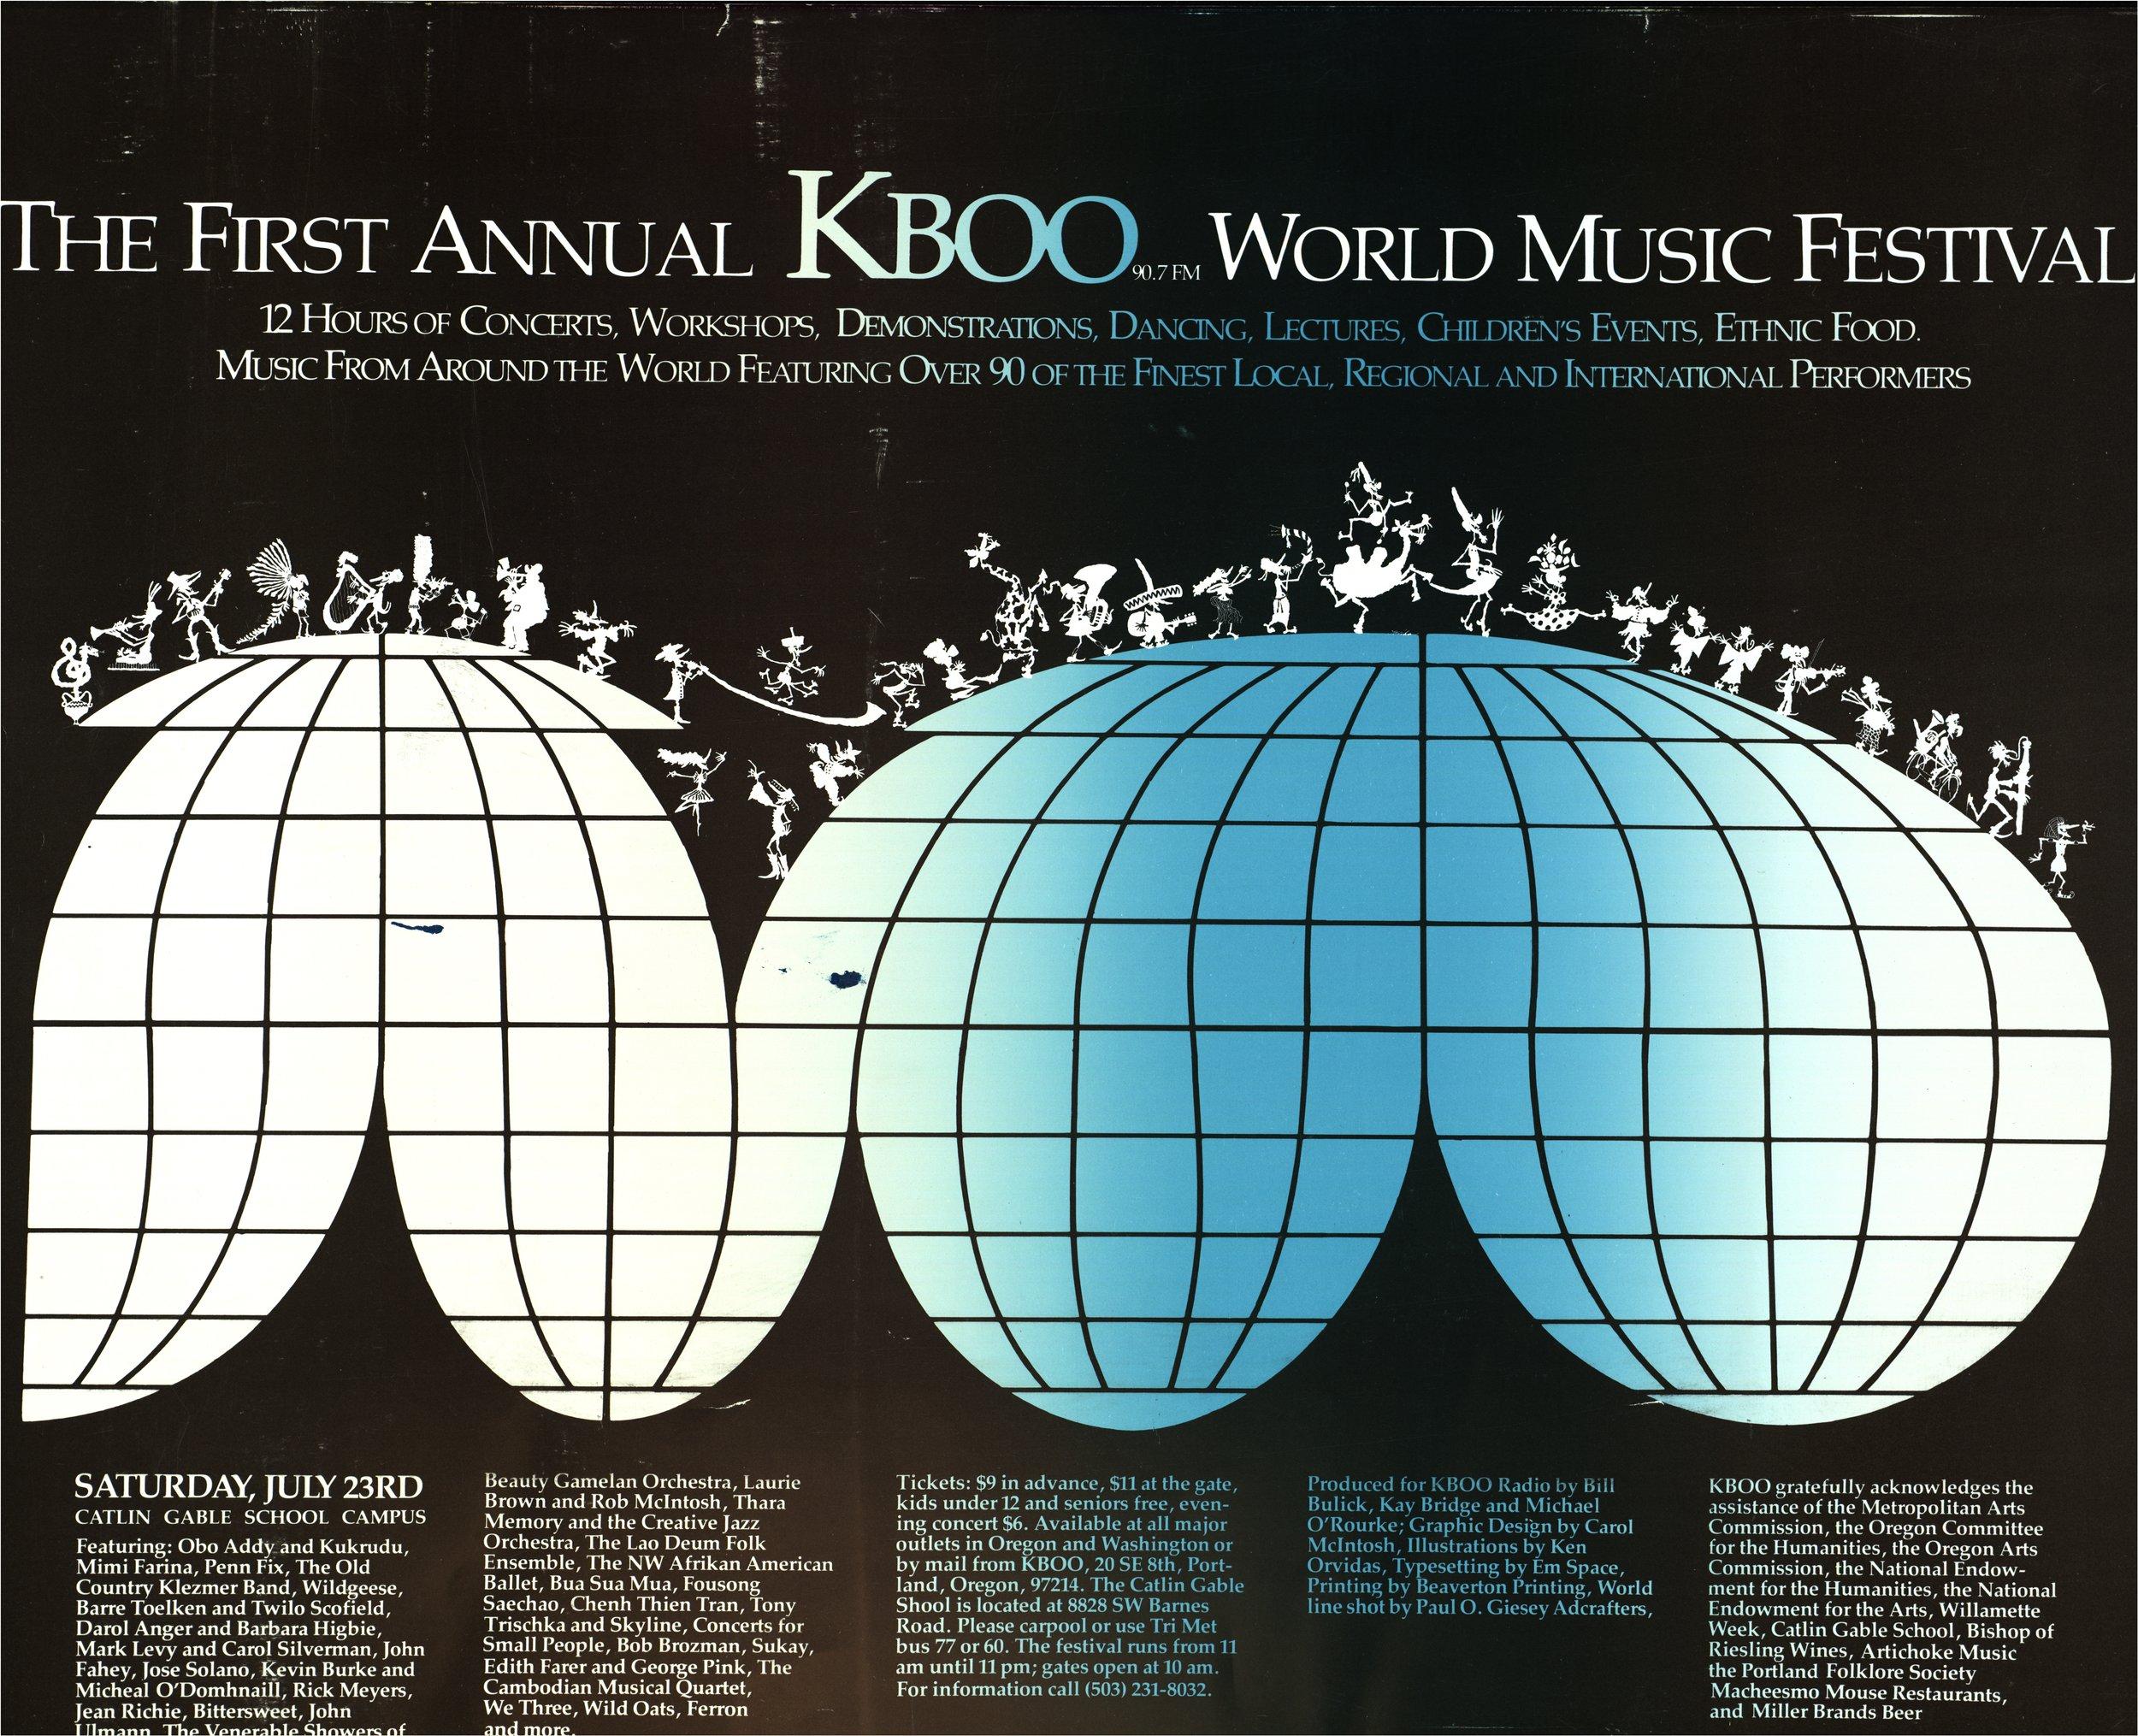 KBOO_Posters_OS_WorldMusicFestival_First.jpg